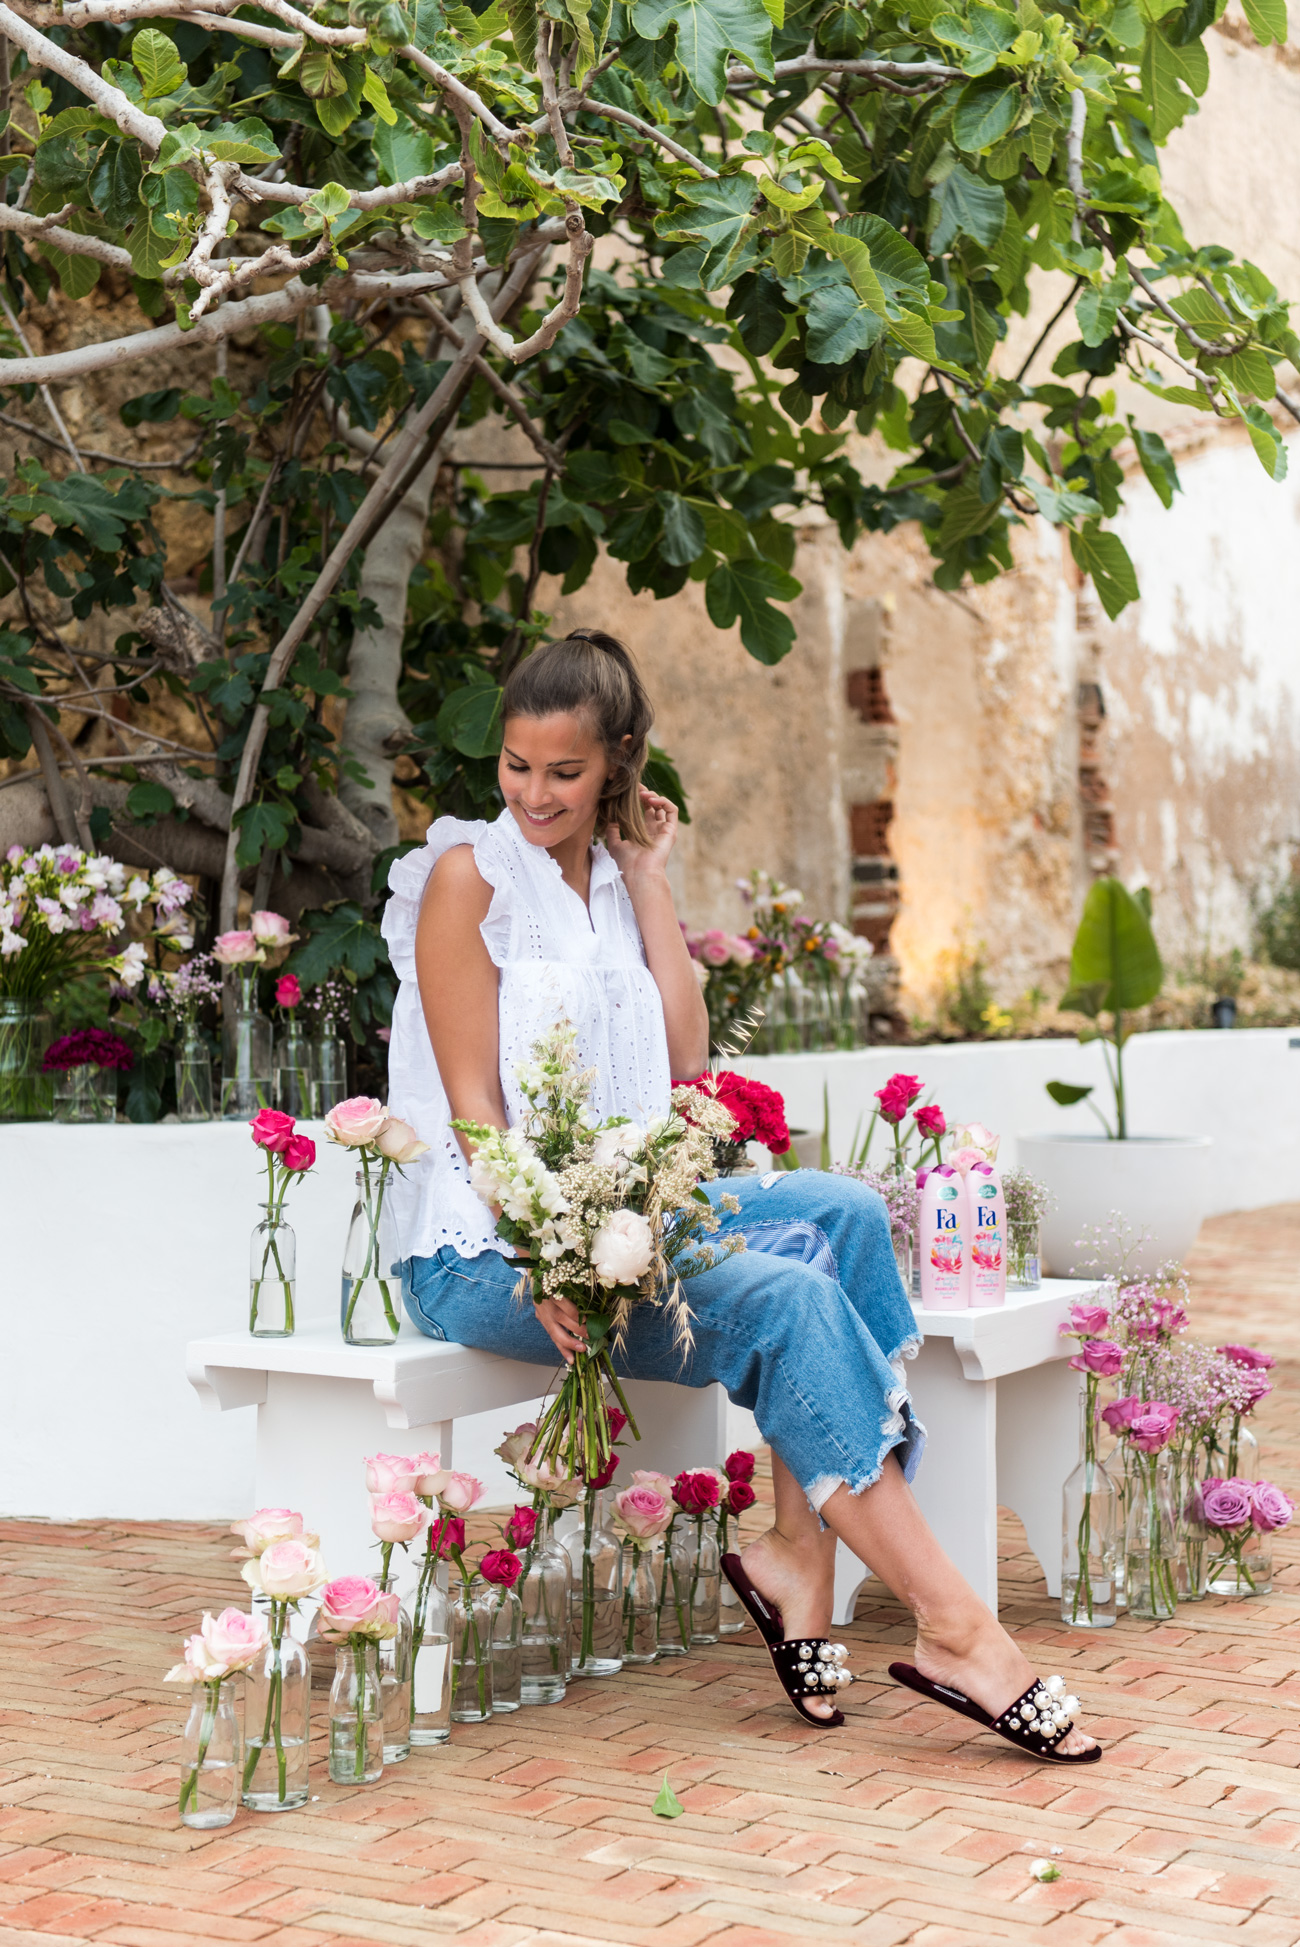 miu-miu-perlen-sandalen-slipper-pearl-velvet-sandals-blogger-style-fashiioncarpet